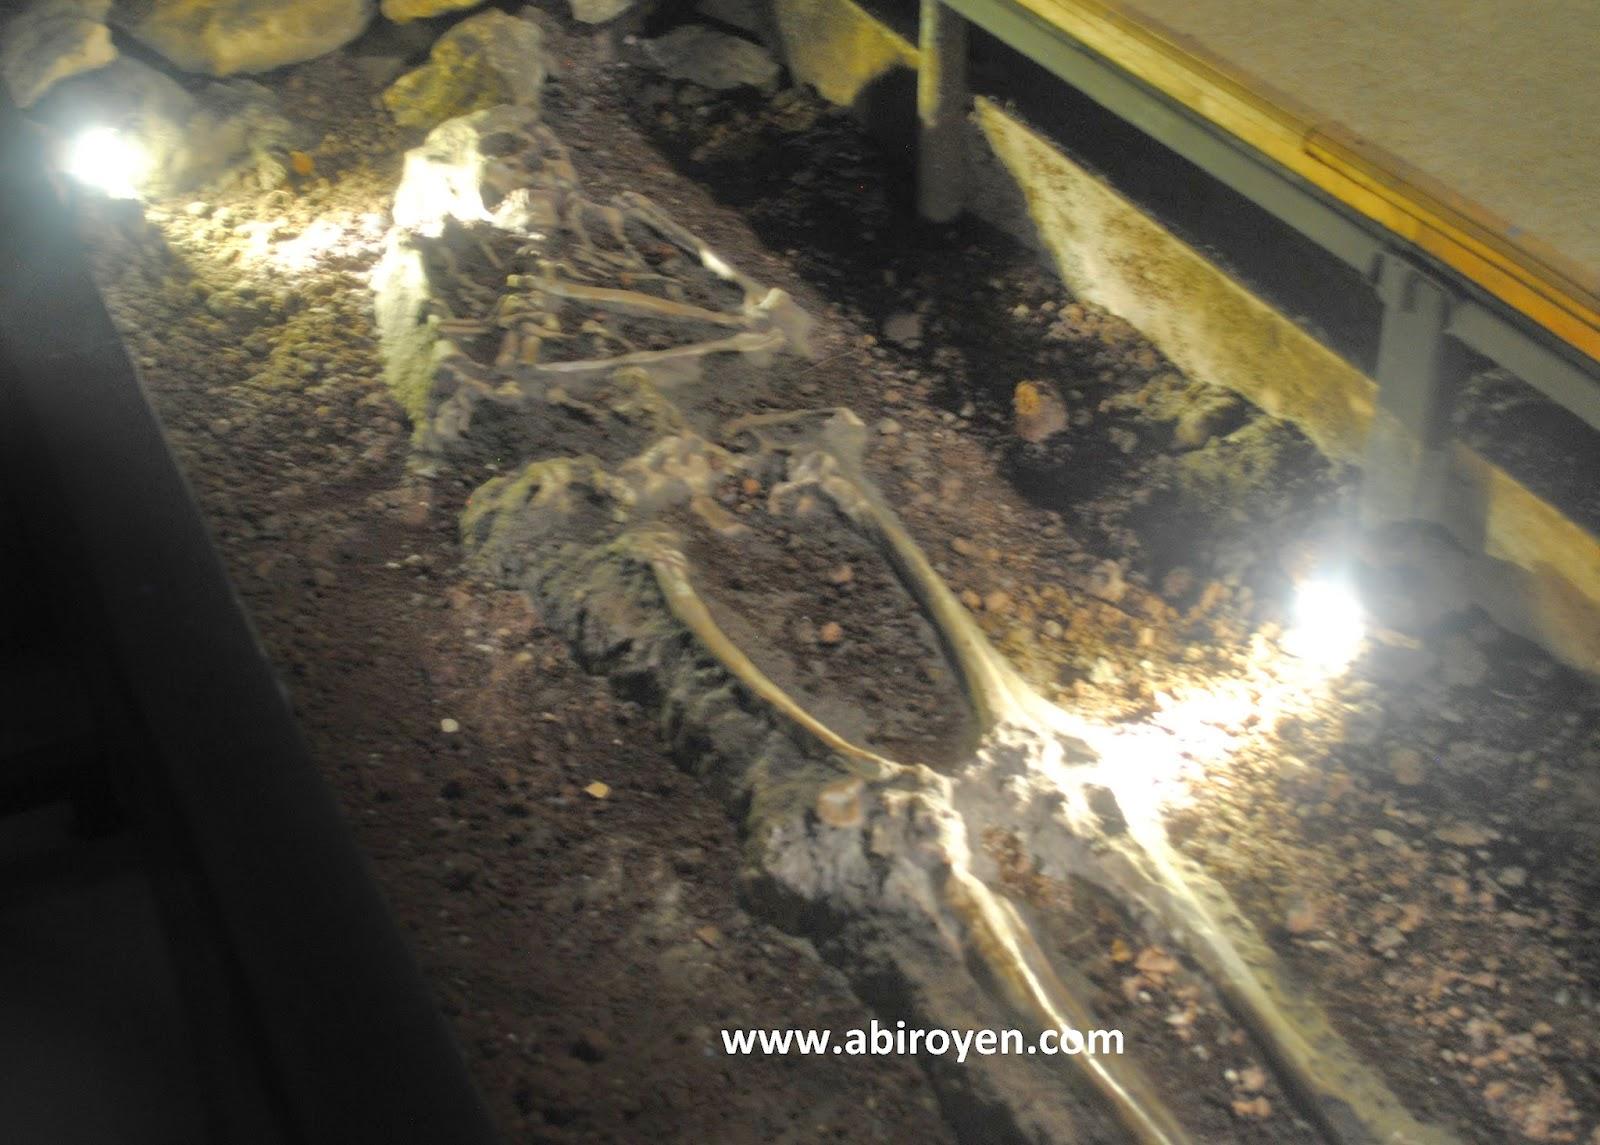 Museum Purbakala Sangiran Sragen Akses Masuk Keunikannya Fosil 2b2 Jalan